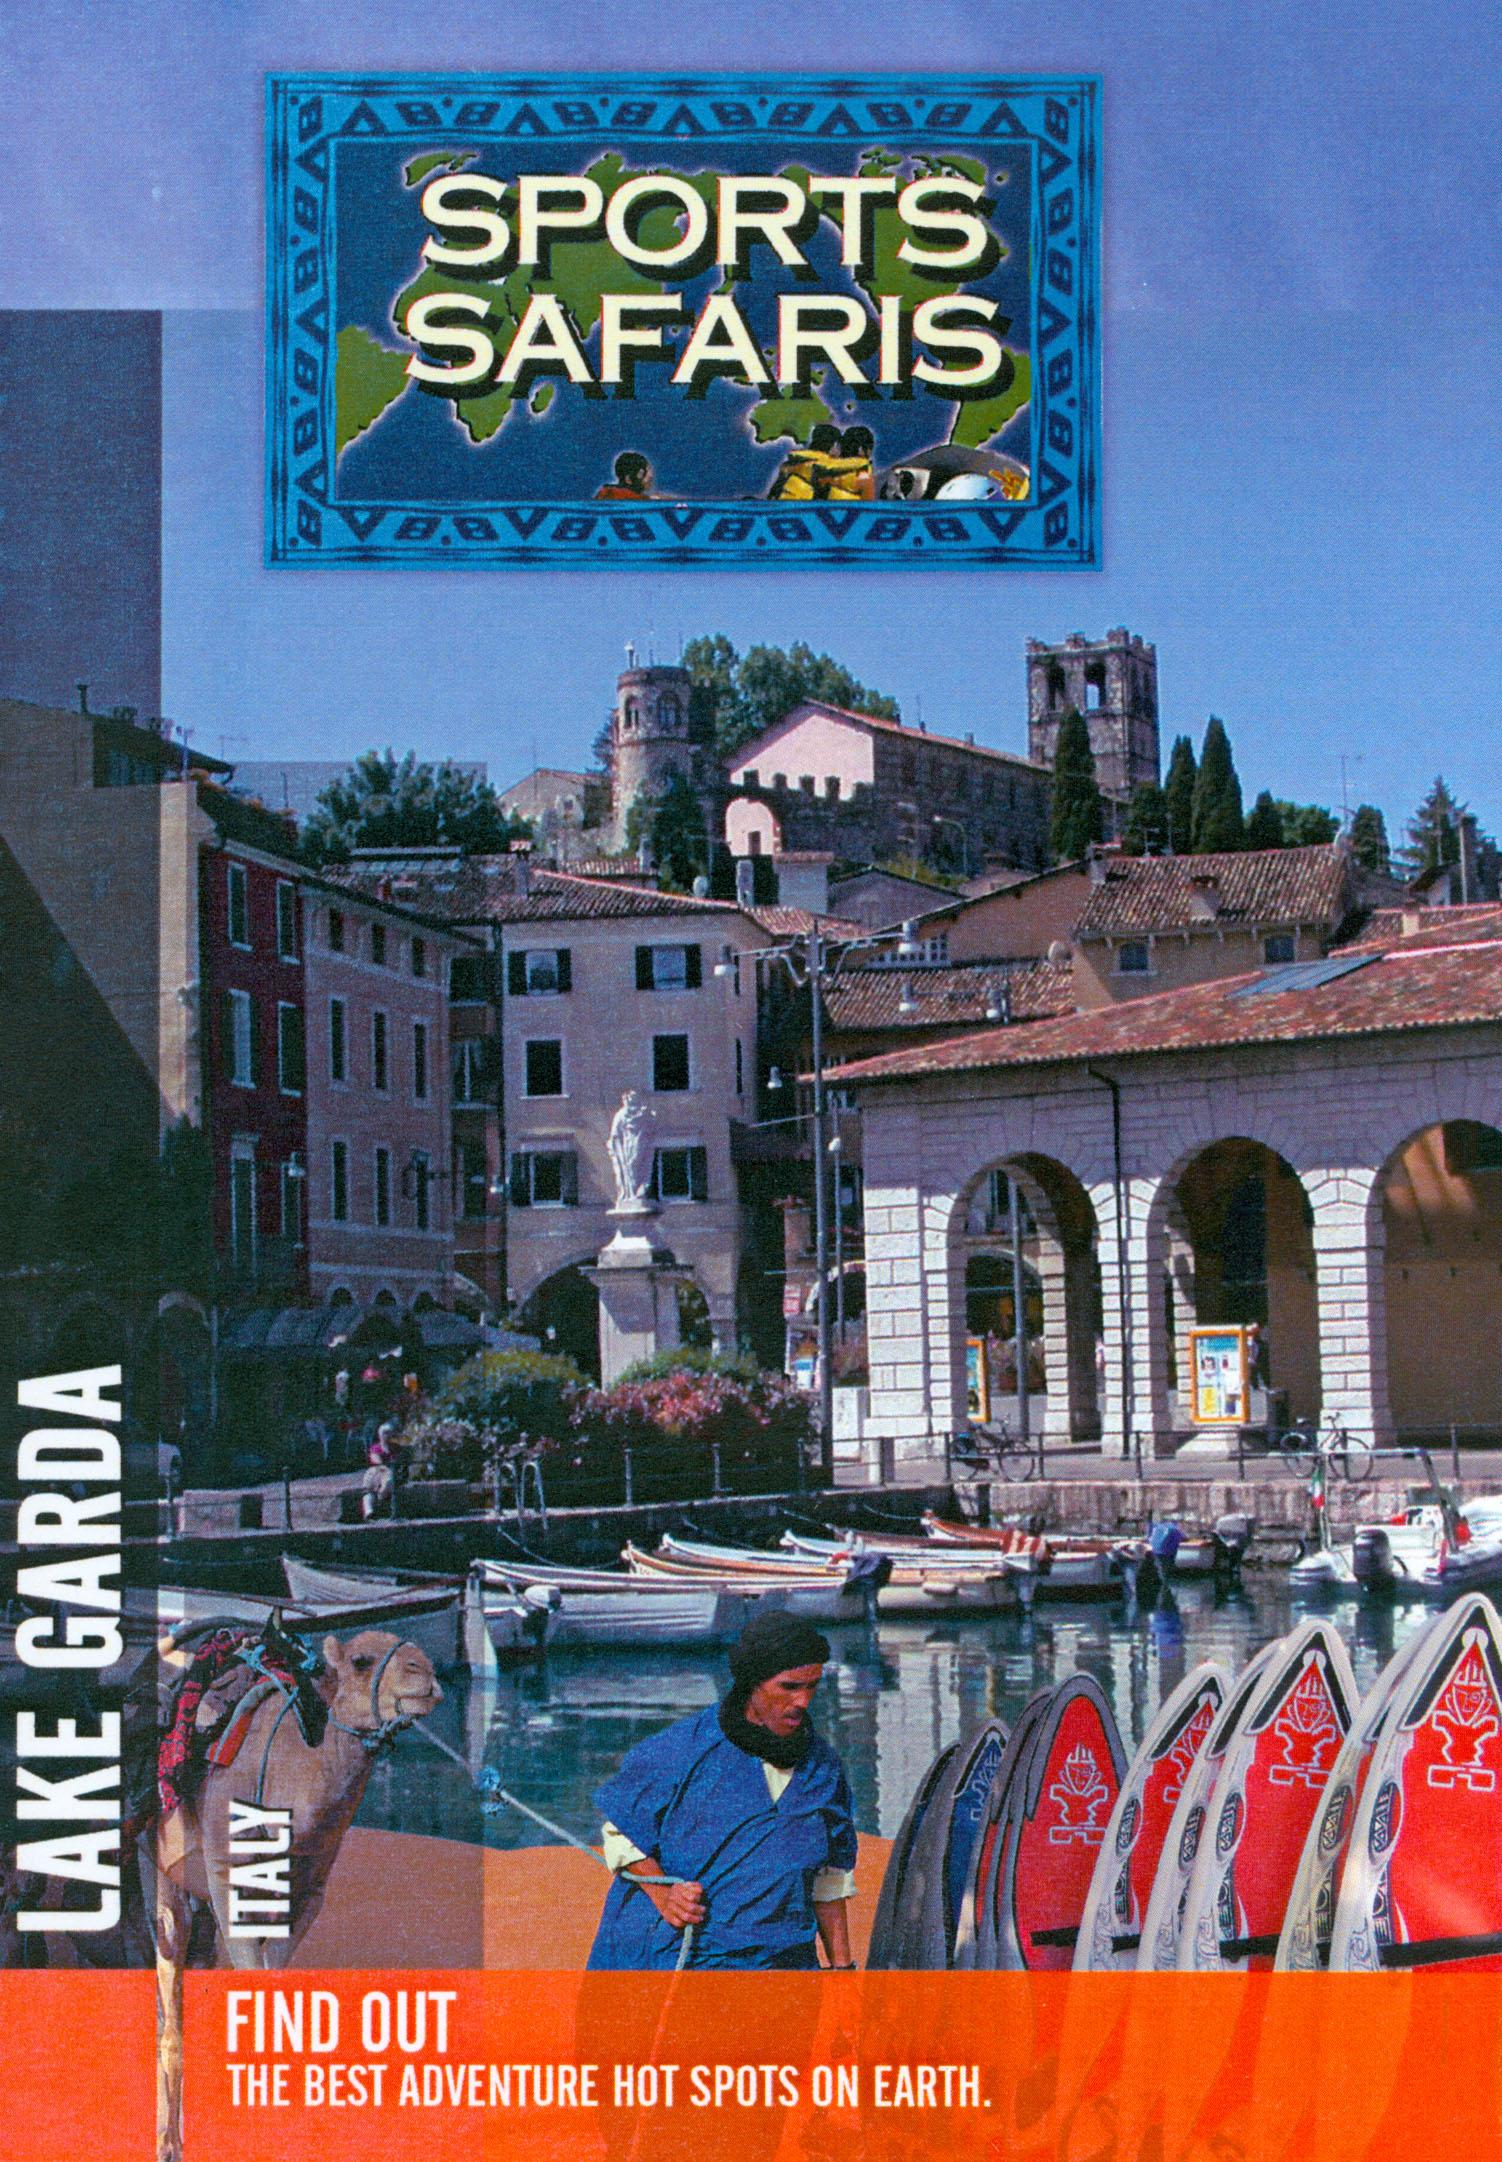 Sports Safaris: Lake Garda - Italy